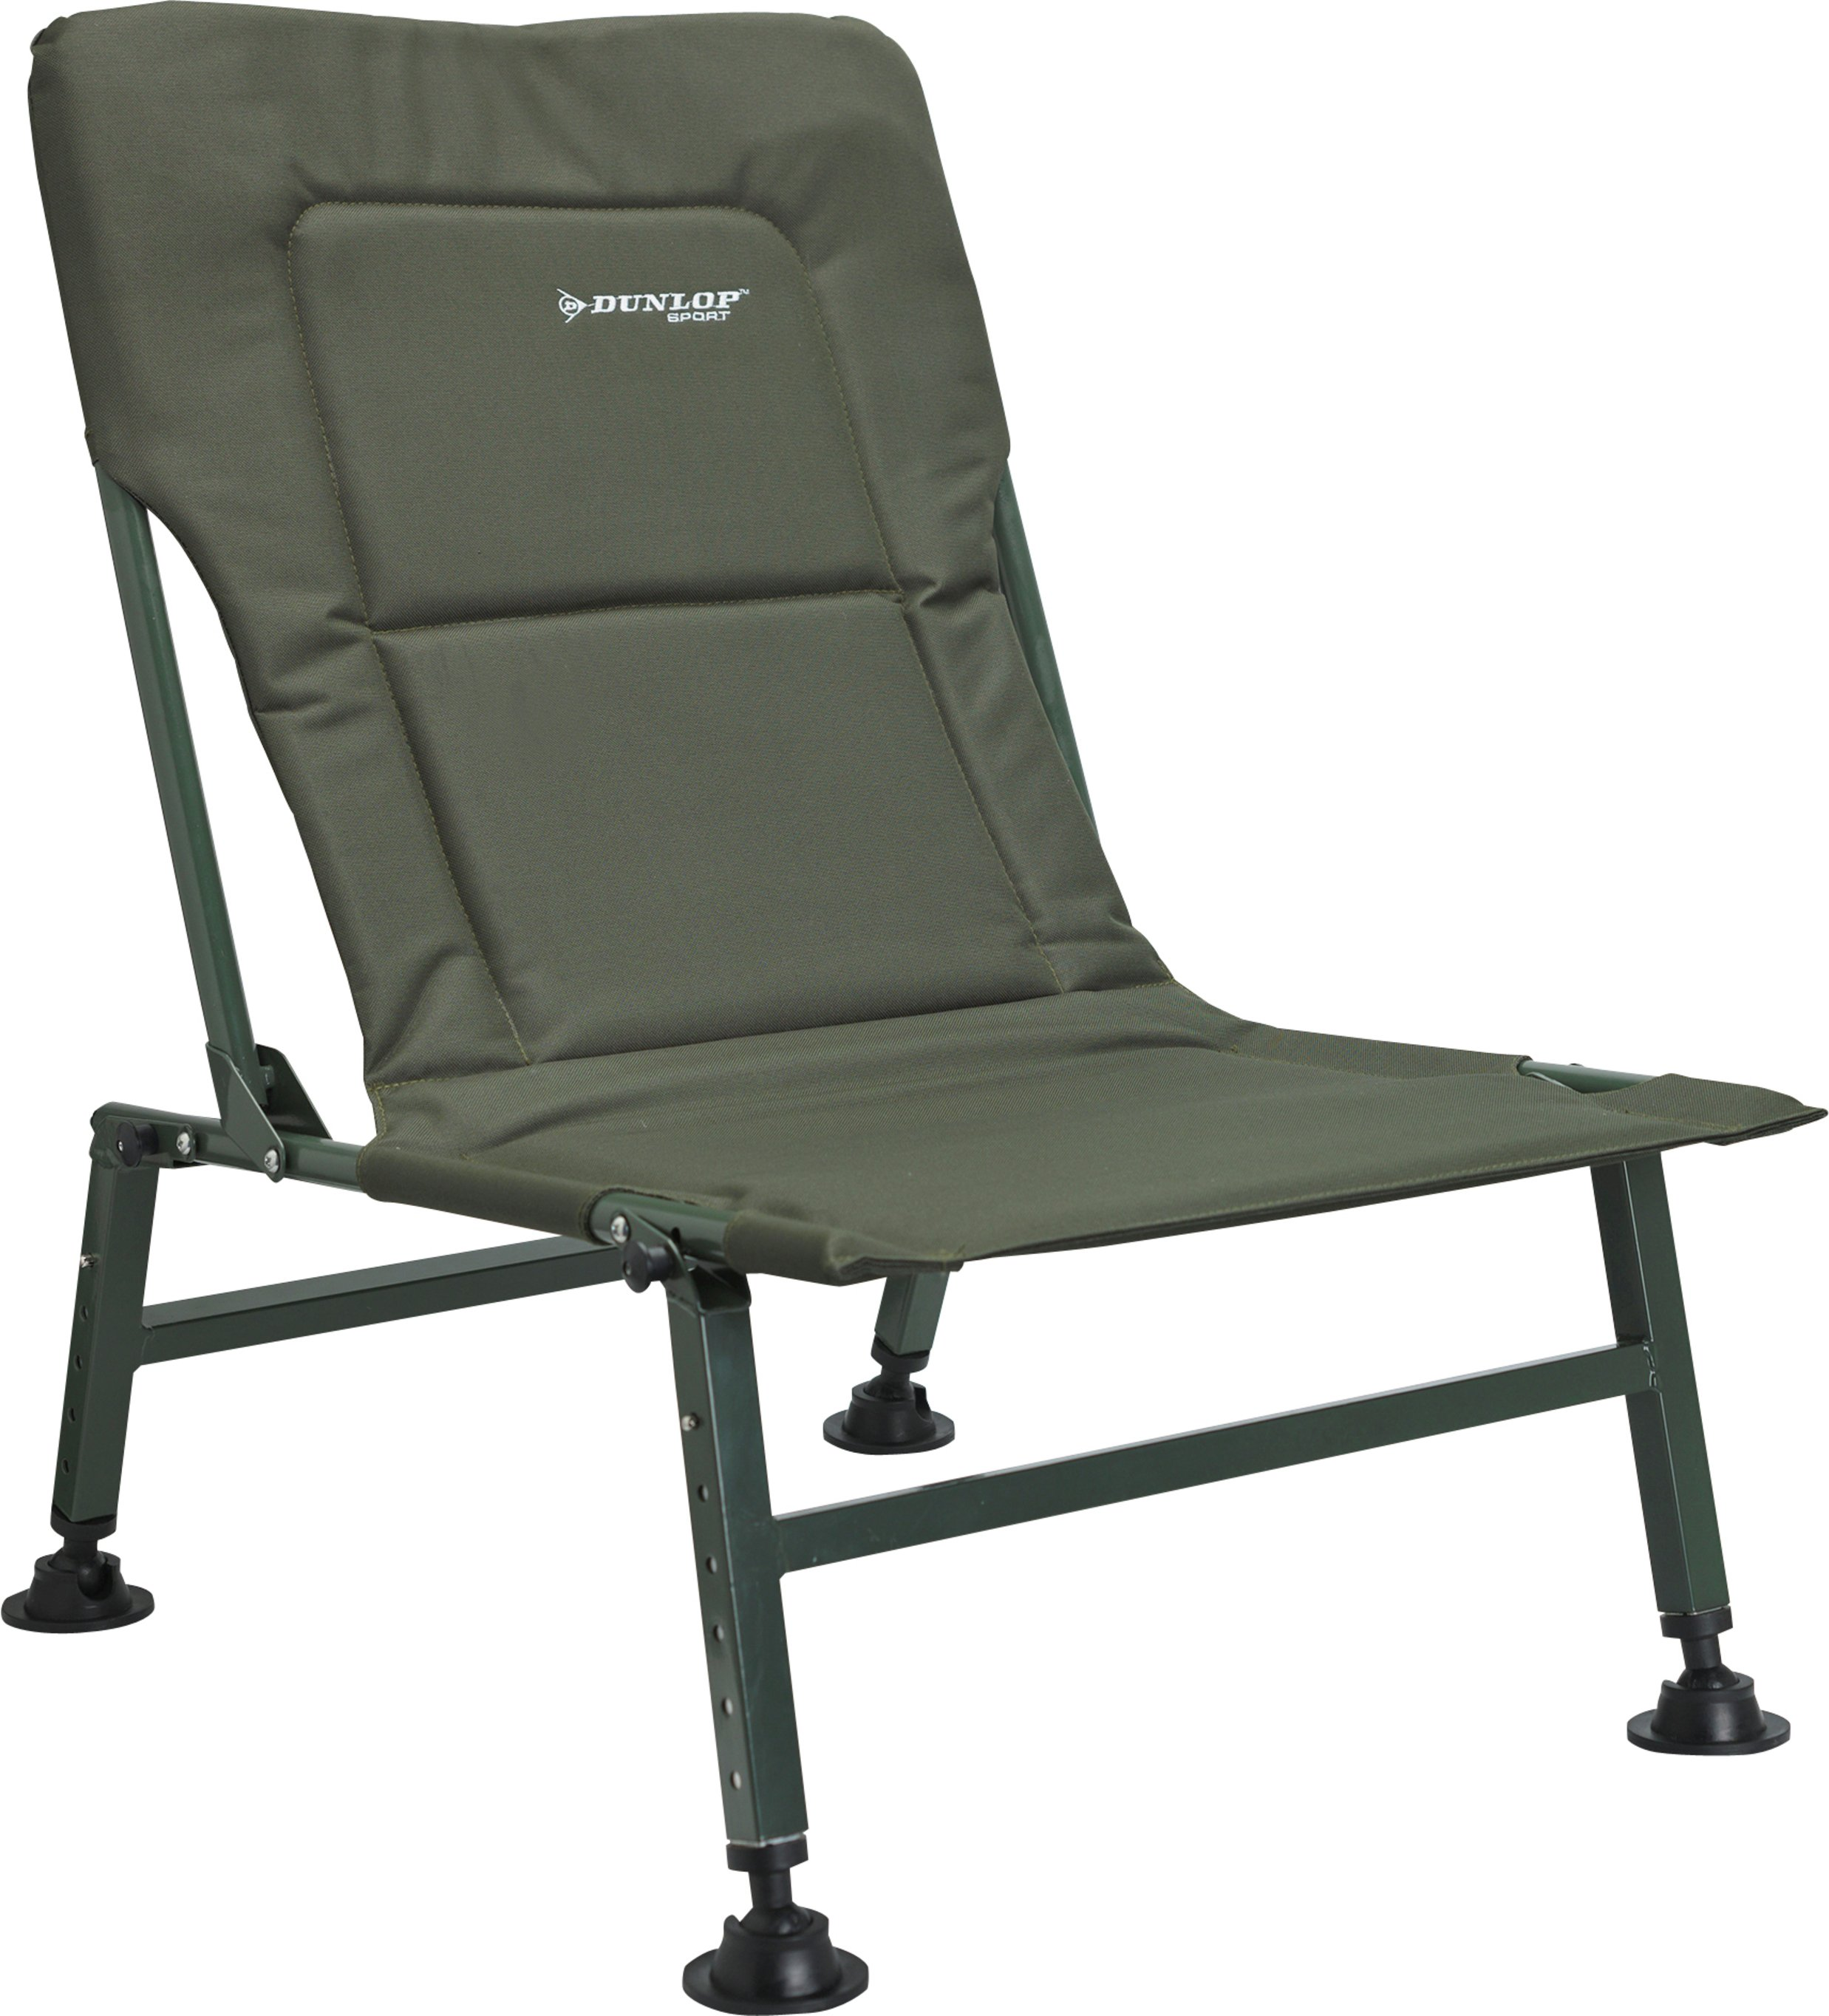 fishing chair argos walmart mat buy dunlop carp accessories click to zoom